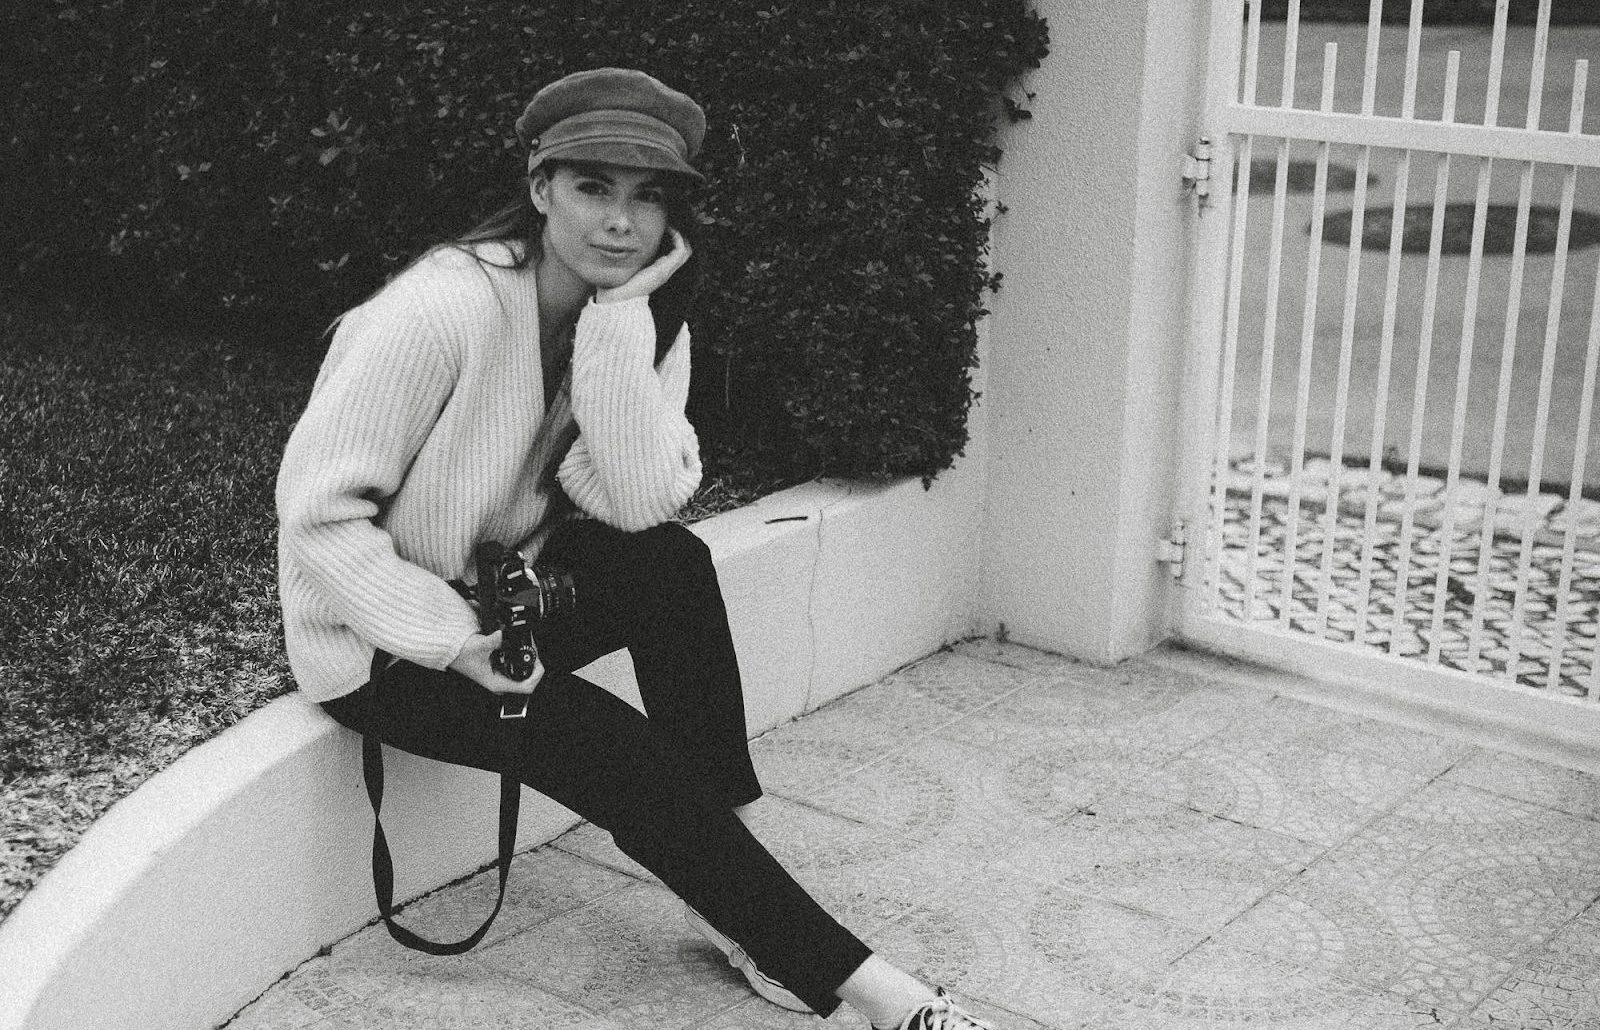 Sommar Intervju: Sandra Moreira